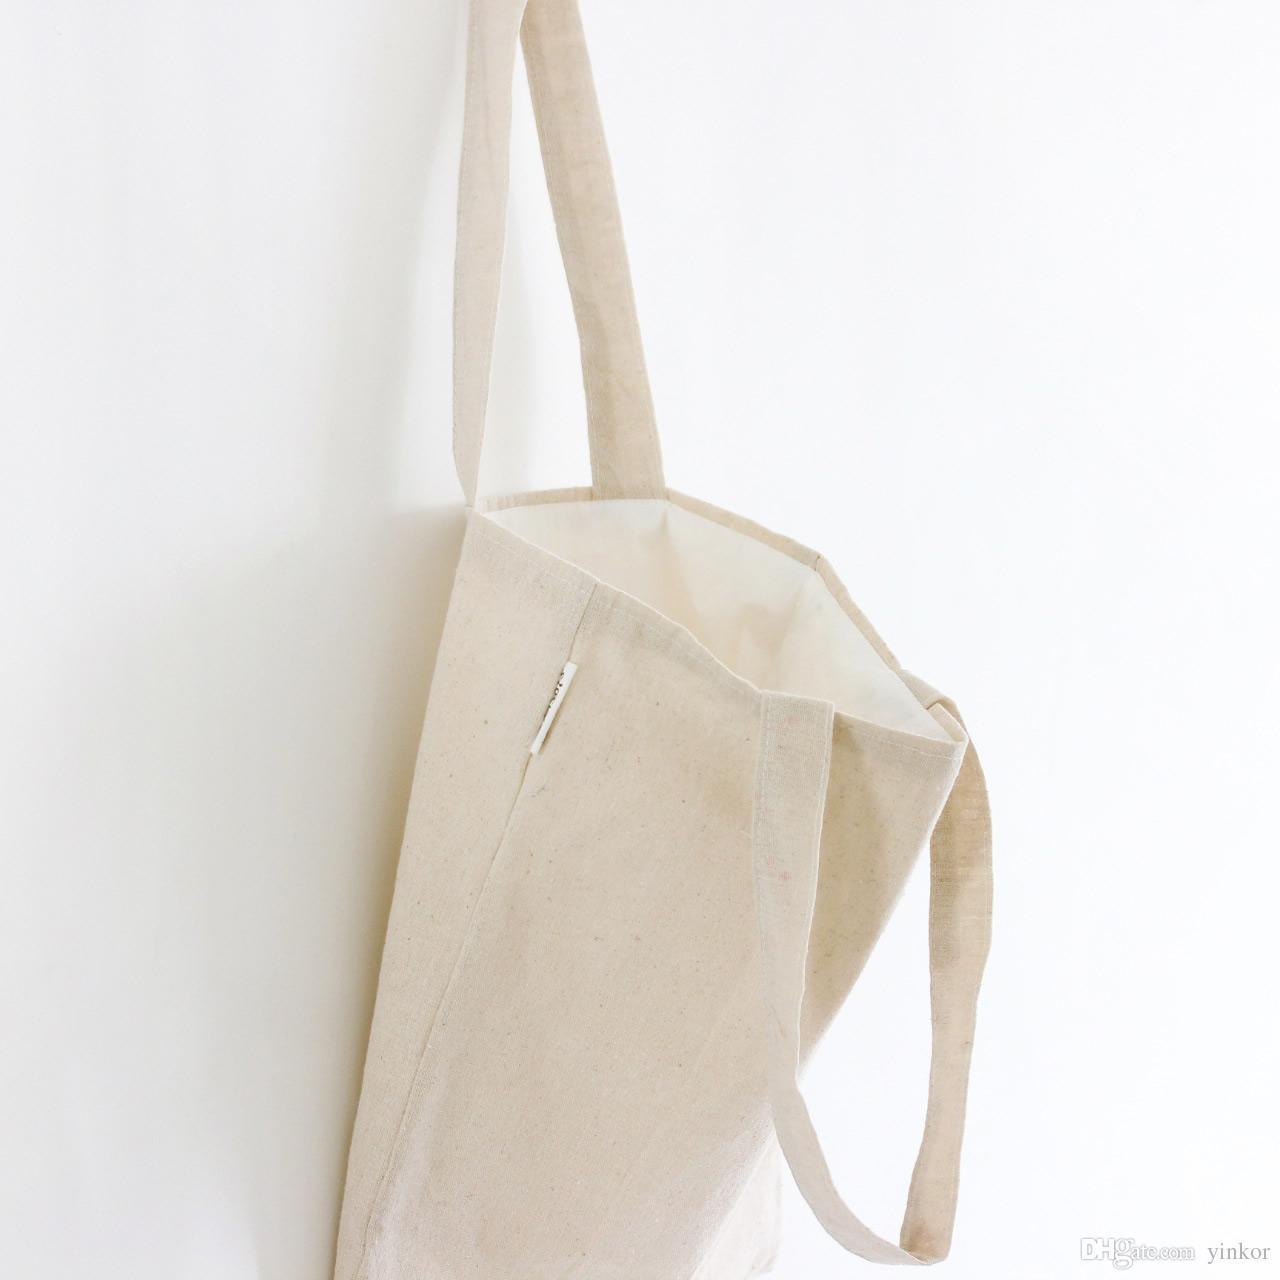 Pure Cotton Linen Canvas Plain Colors Tote Bags Sling Messenger Shoulder  Shopping Bag With Cotton Lining Zipper Or No Zipper Reusable Produce Bags  Purses ... 221180153a